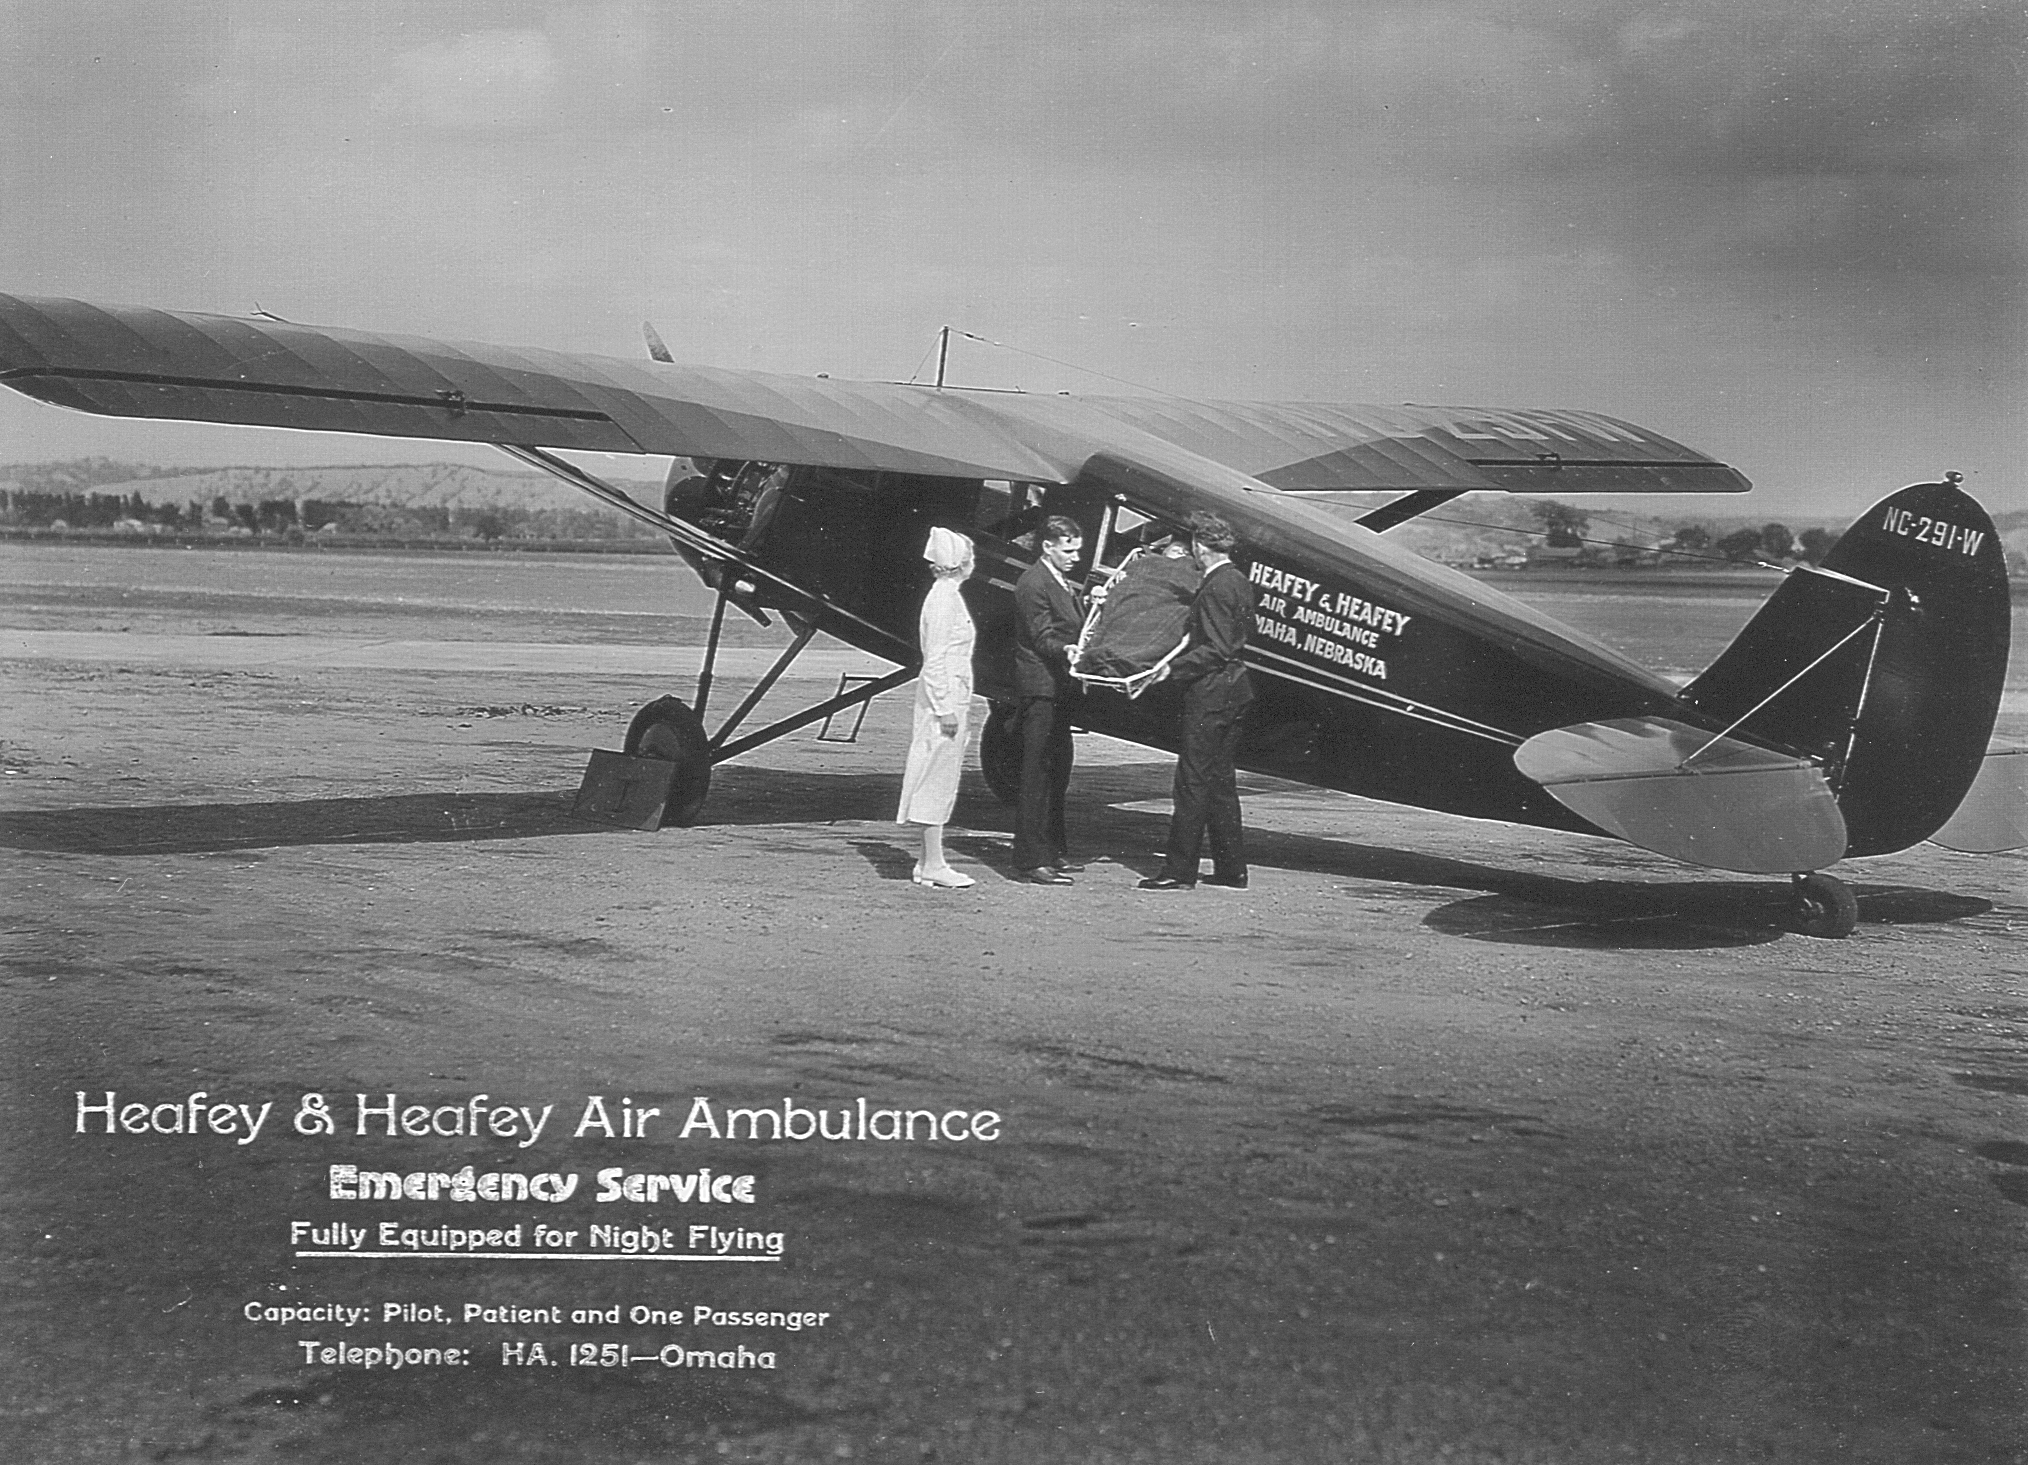 Heafey Air Ambulance